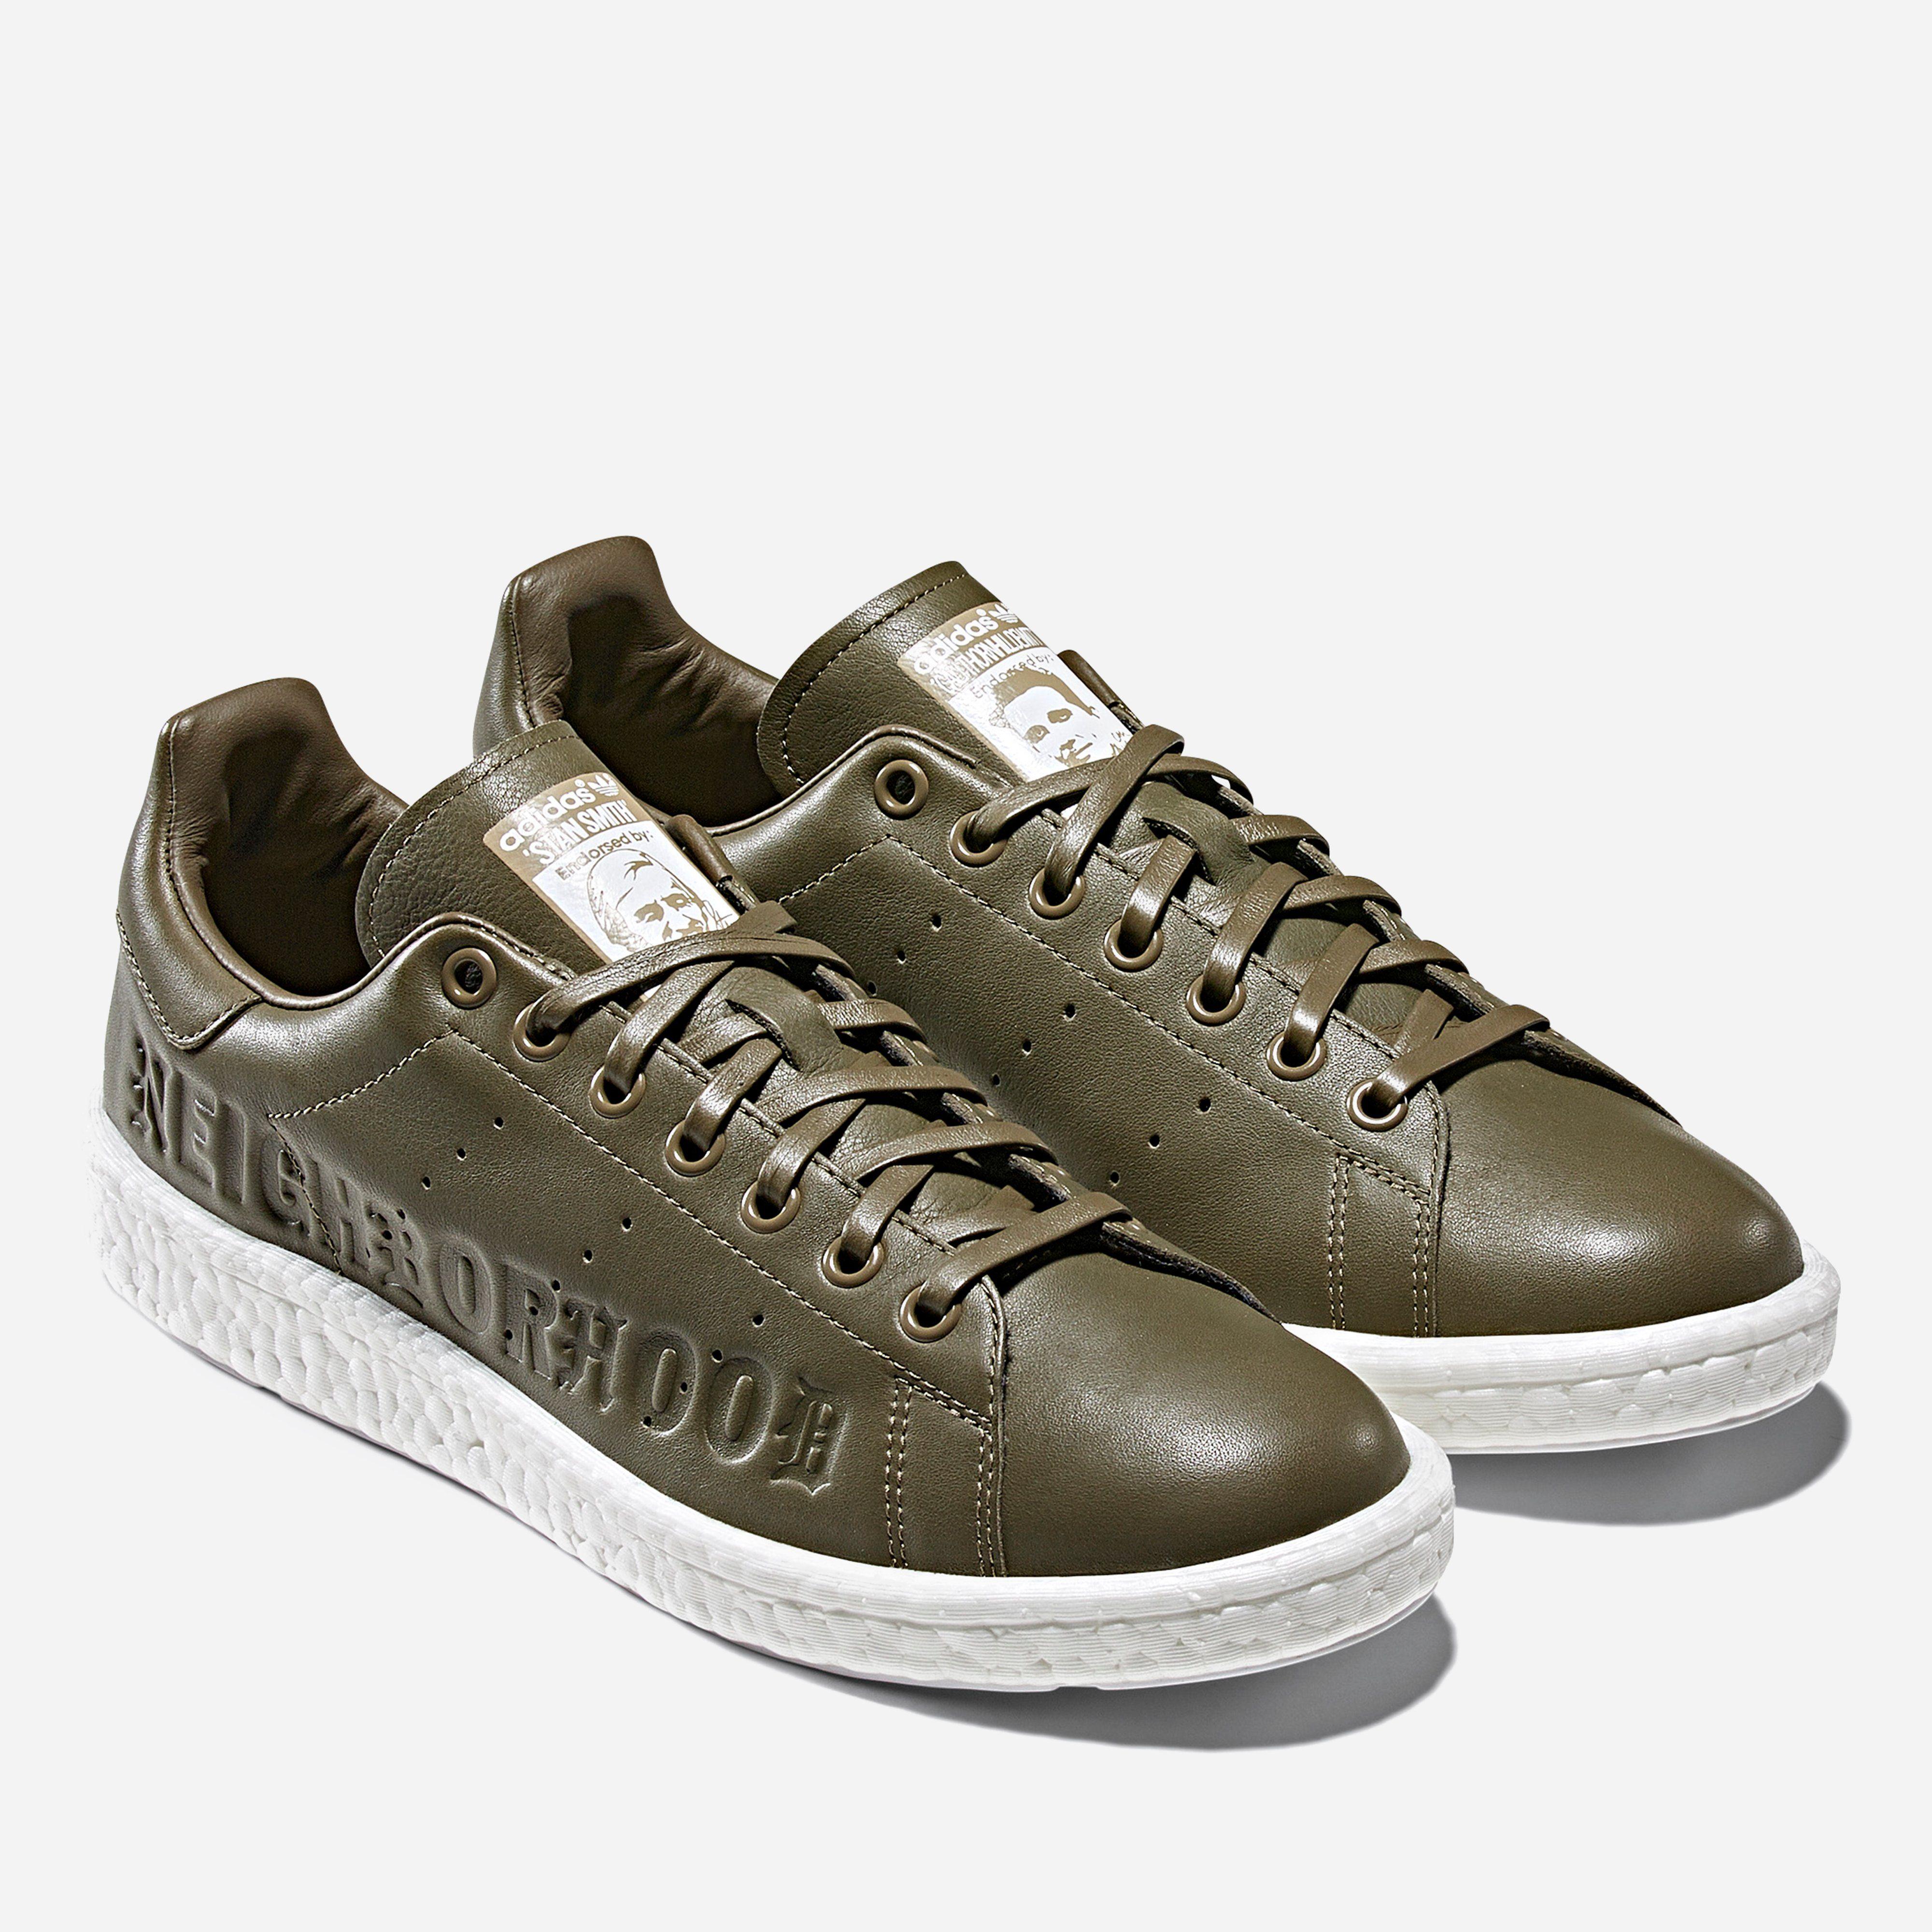 adidas Originals x Neighborhood Stan Smith Boost